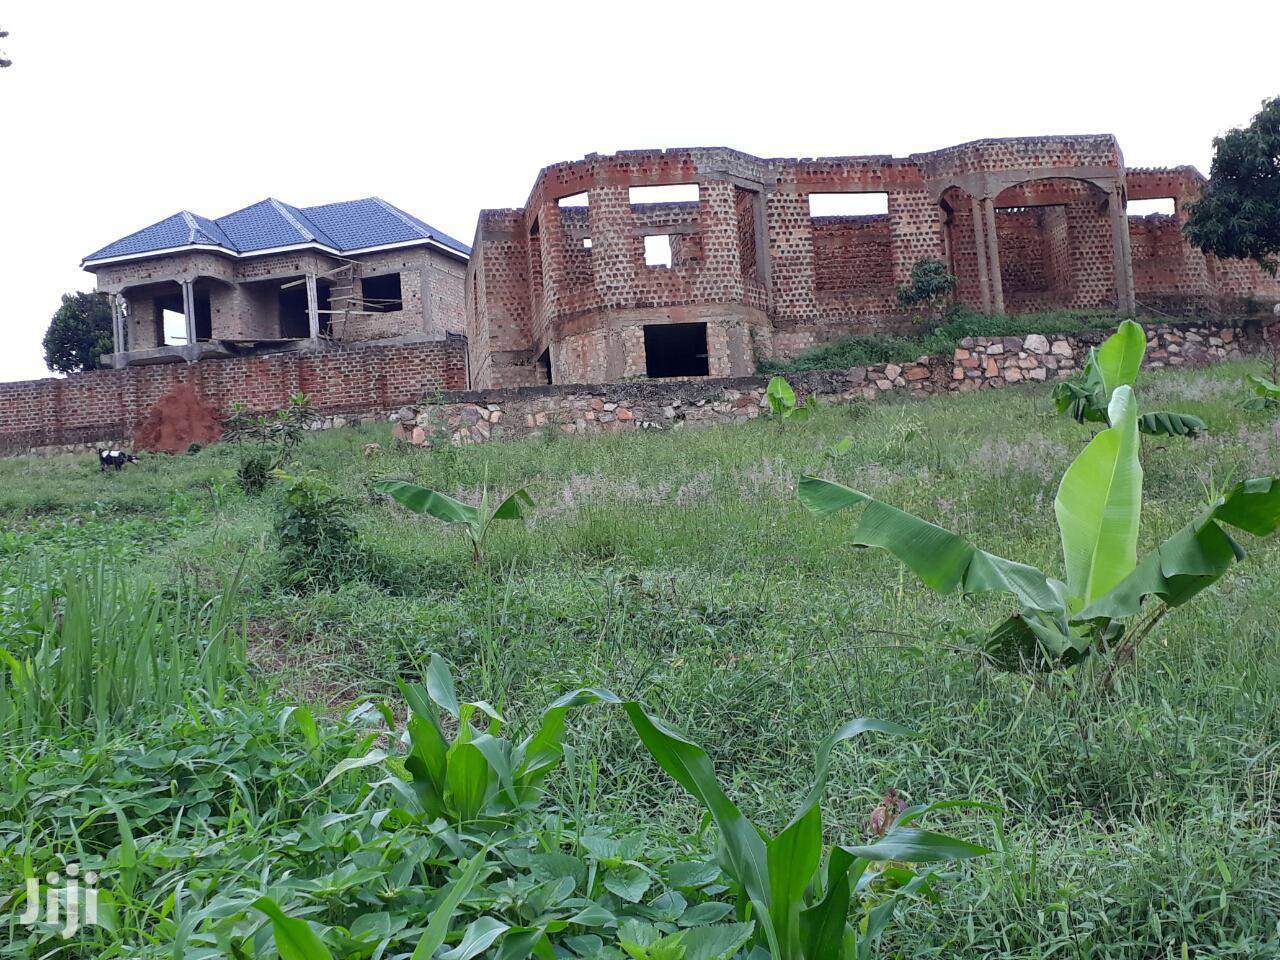 5 Bedrooms House In Salaama Munyonyo Rd Kabuma